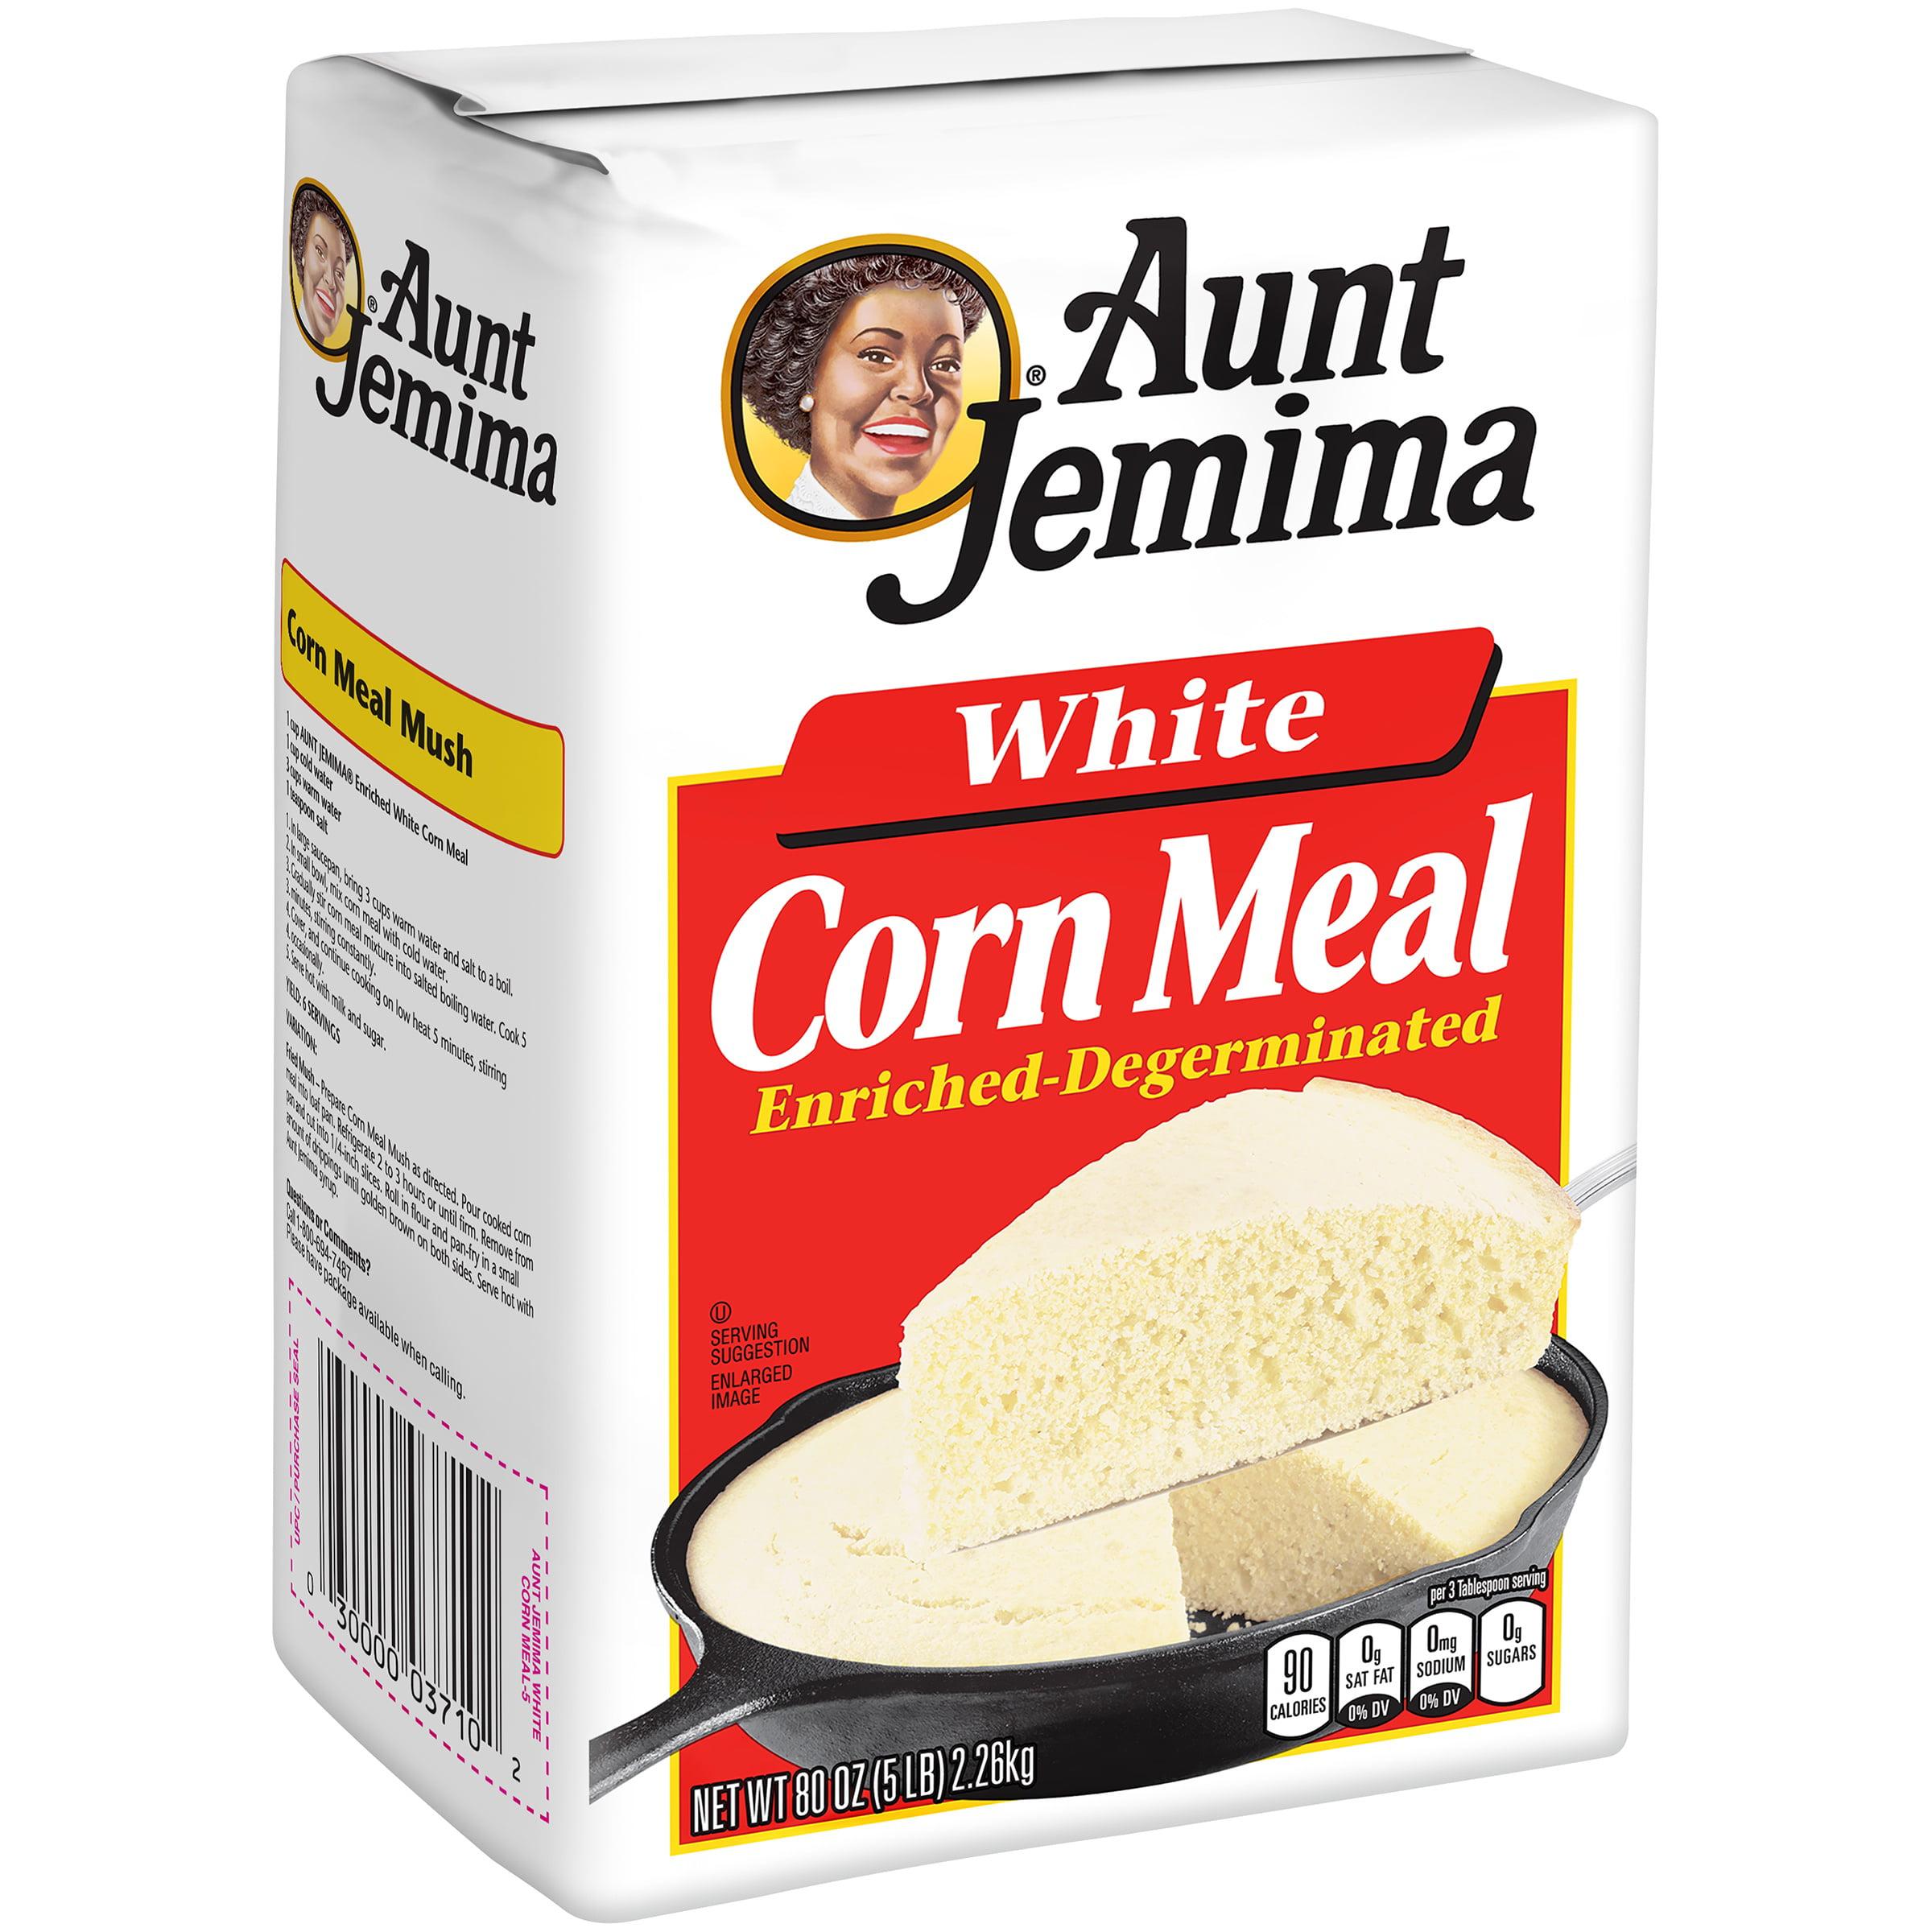 Aunt Jemima Corn Meal White 80 oz. Bag